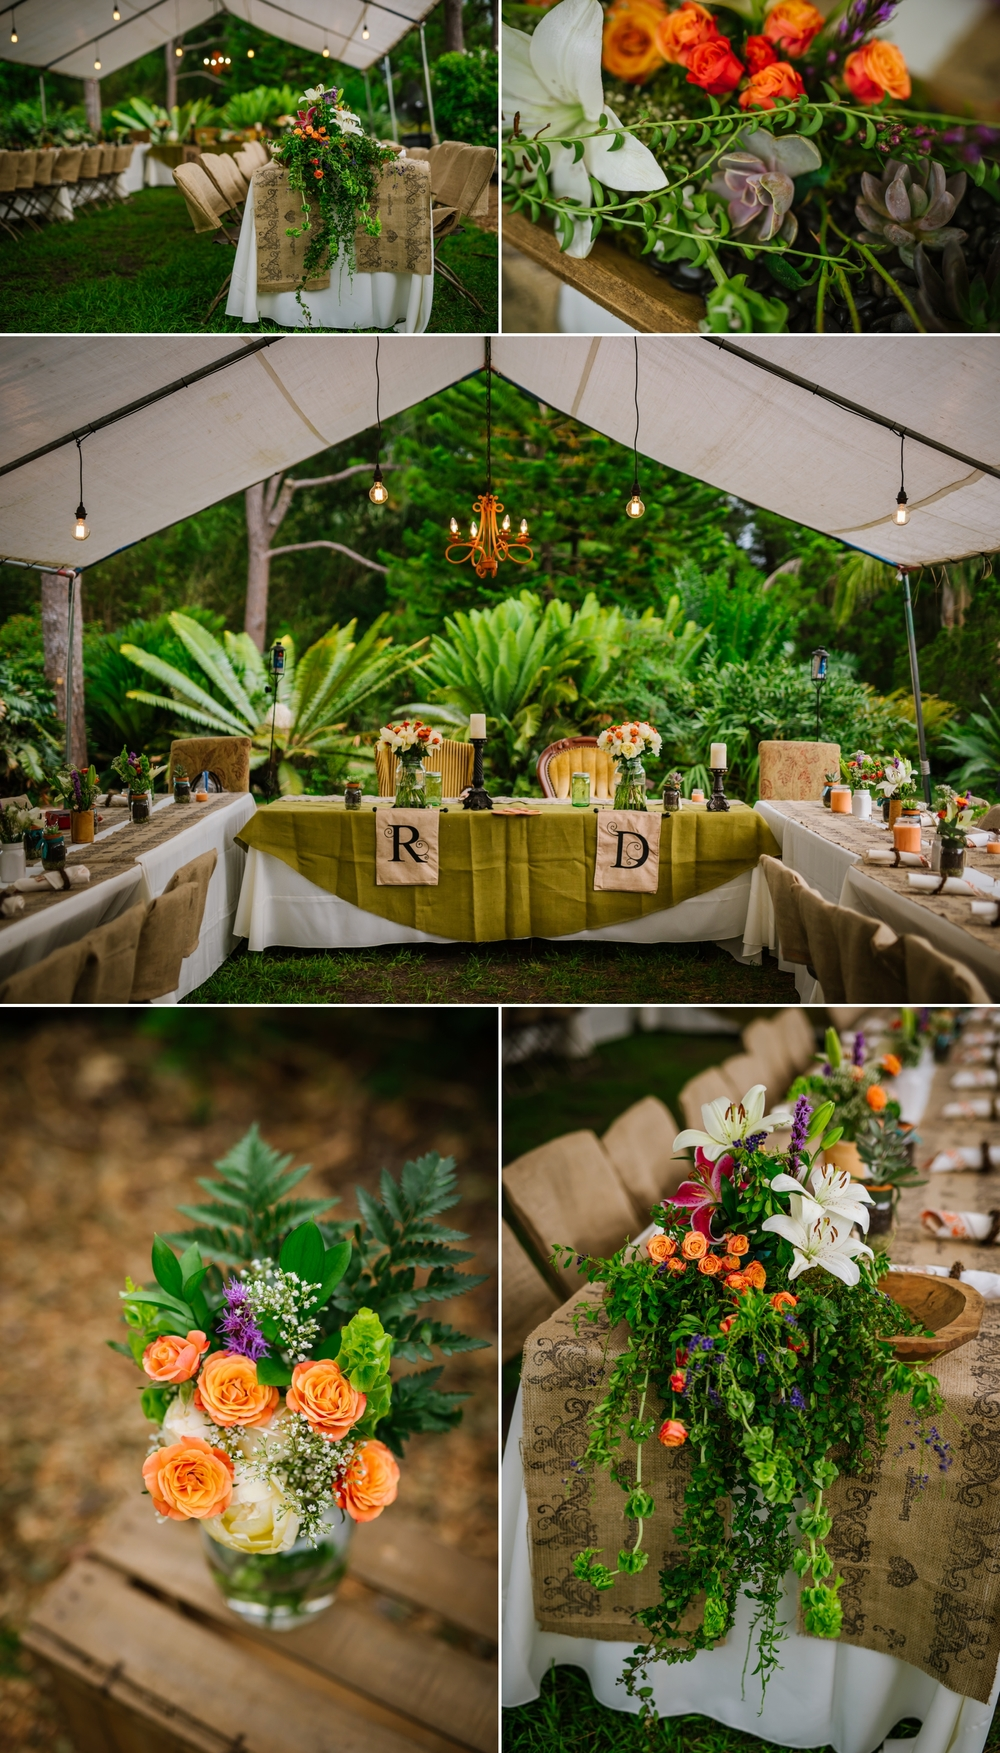 tampa-wedding-photographer-ashlee-hamon-lgbt-wedding_0006.jpg